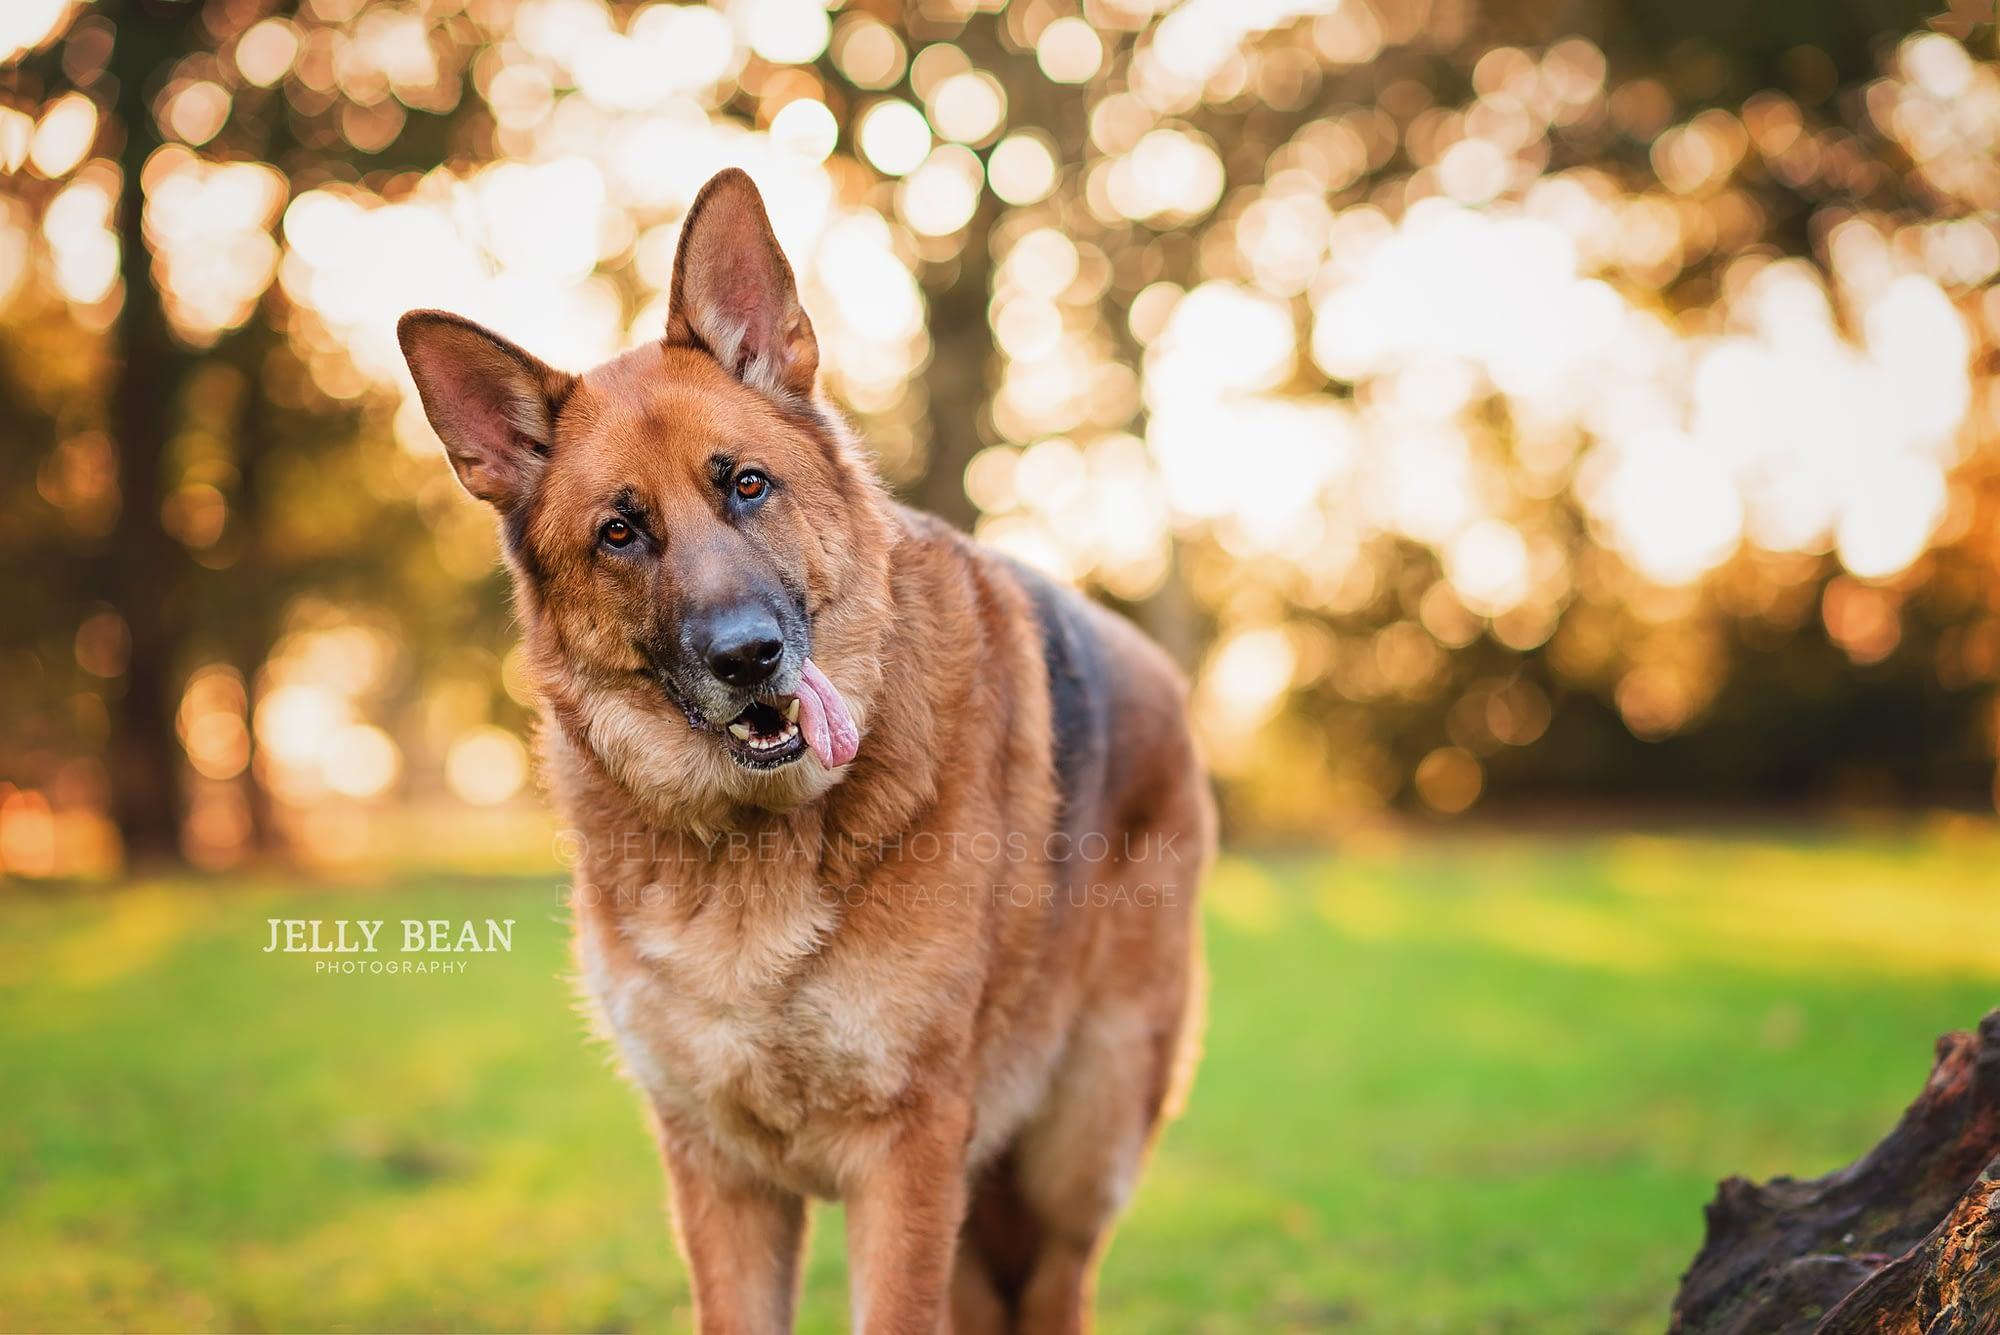 Germand shepherd dog with head tilt